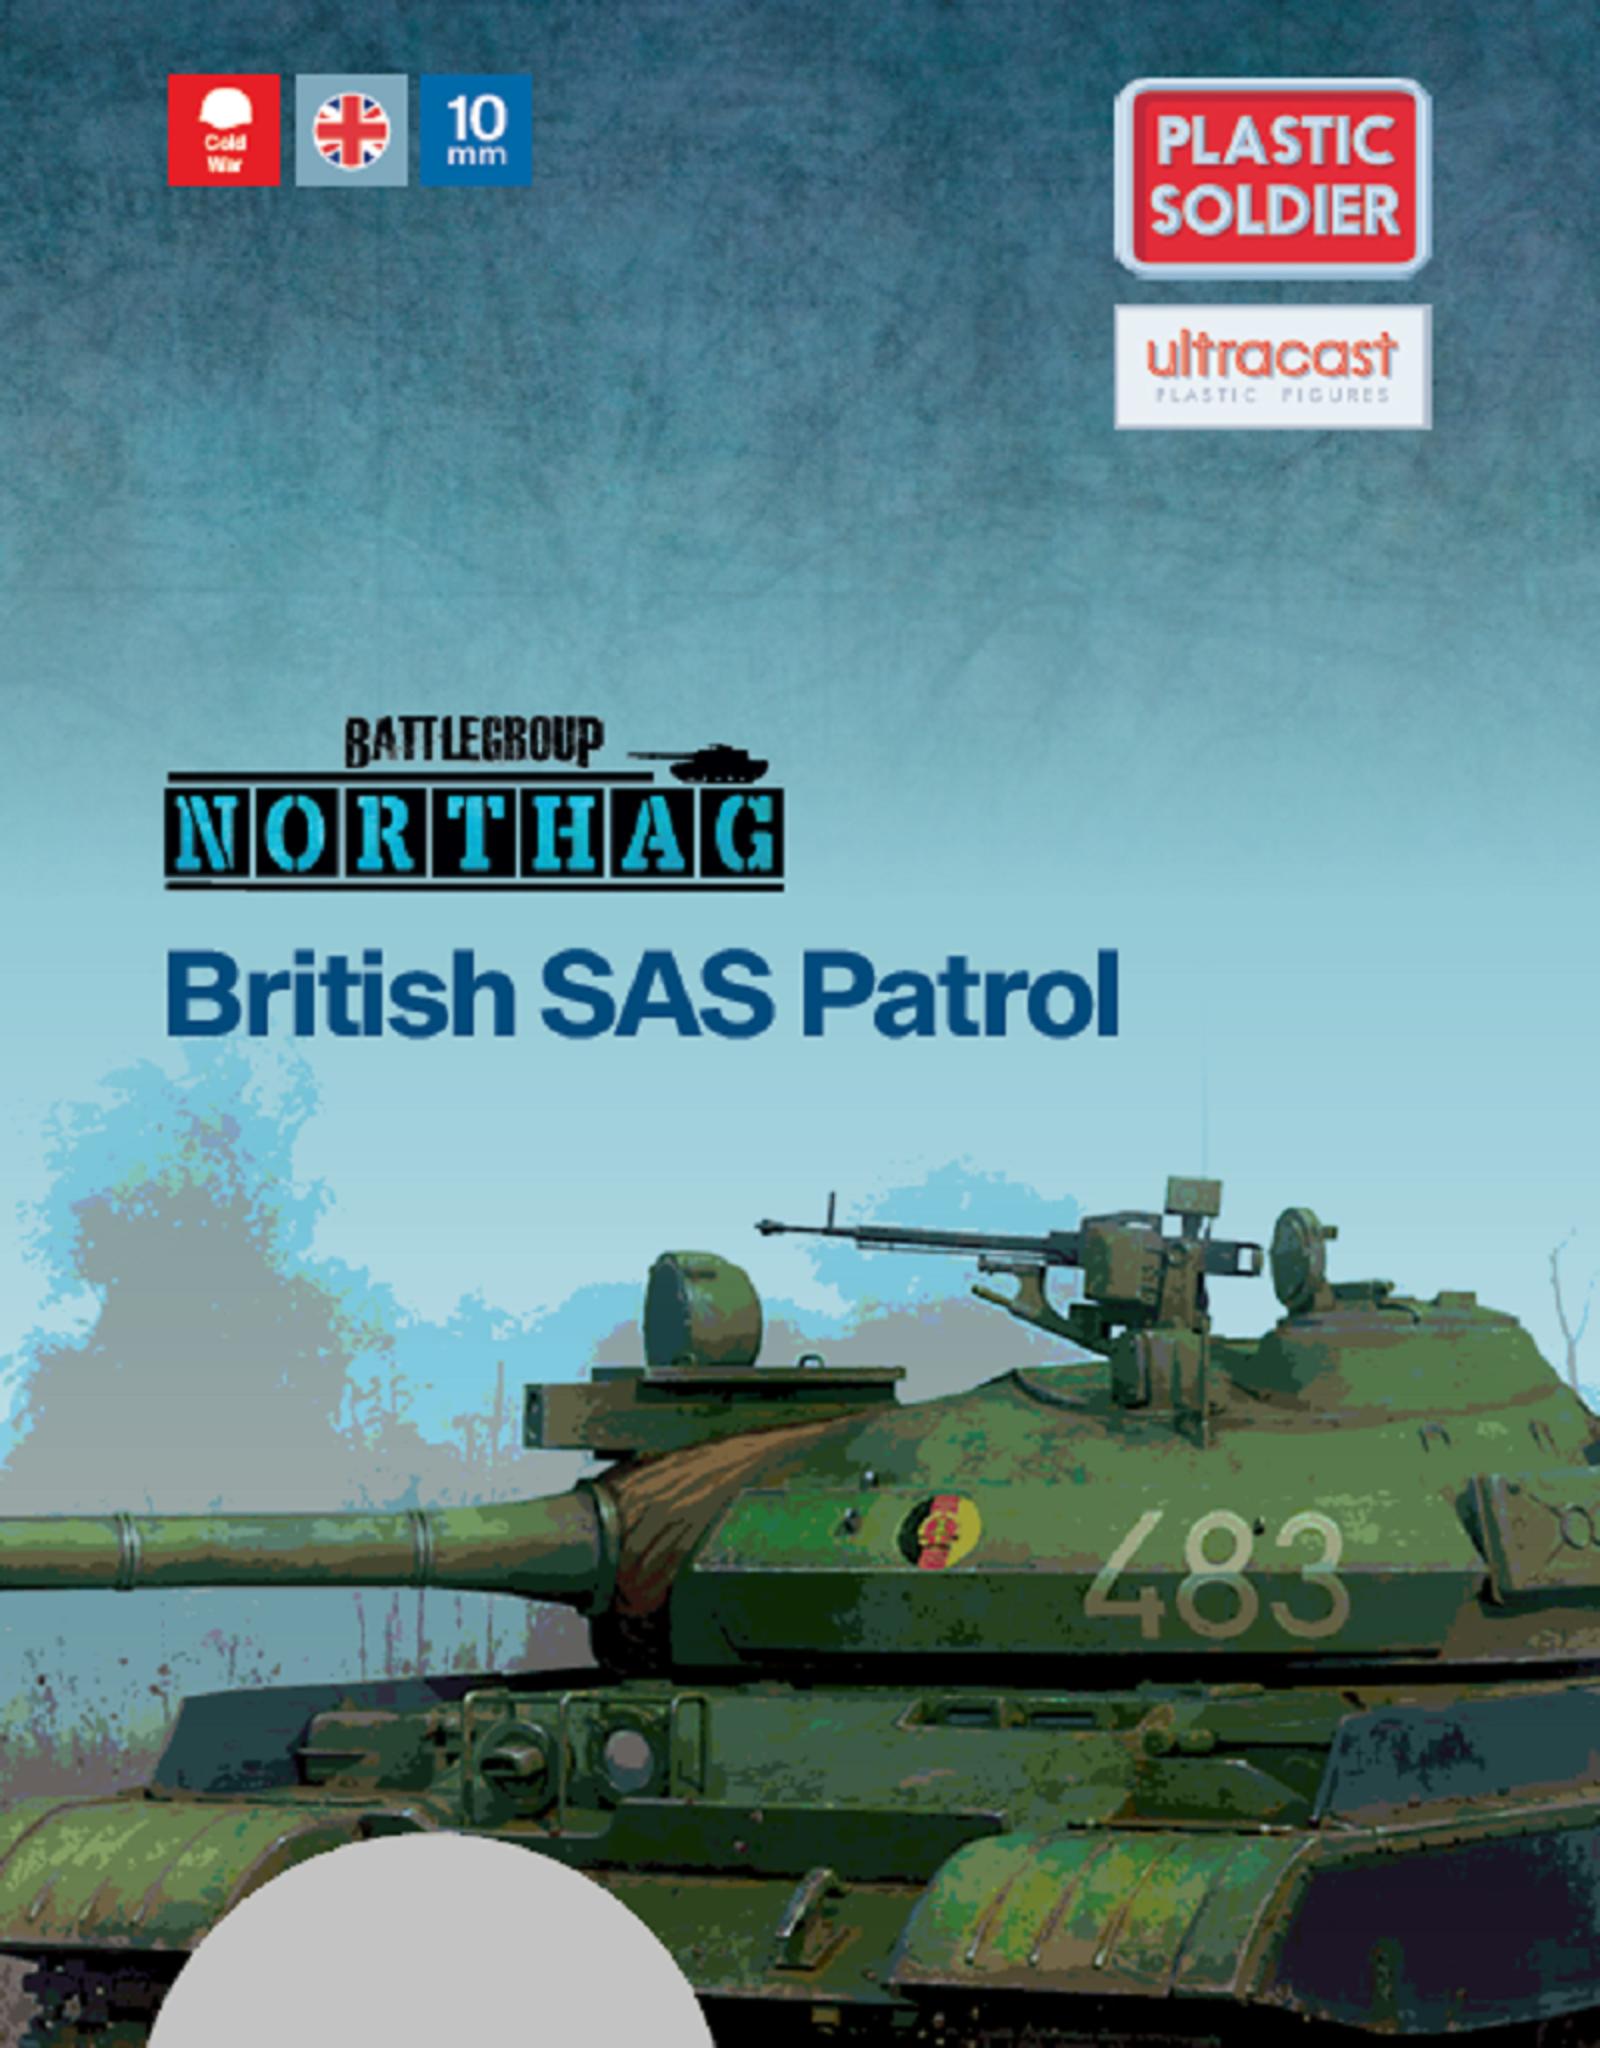 Plastic Soldier Company British SAS Patrol